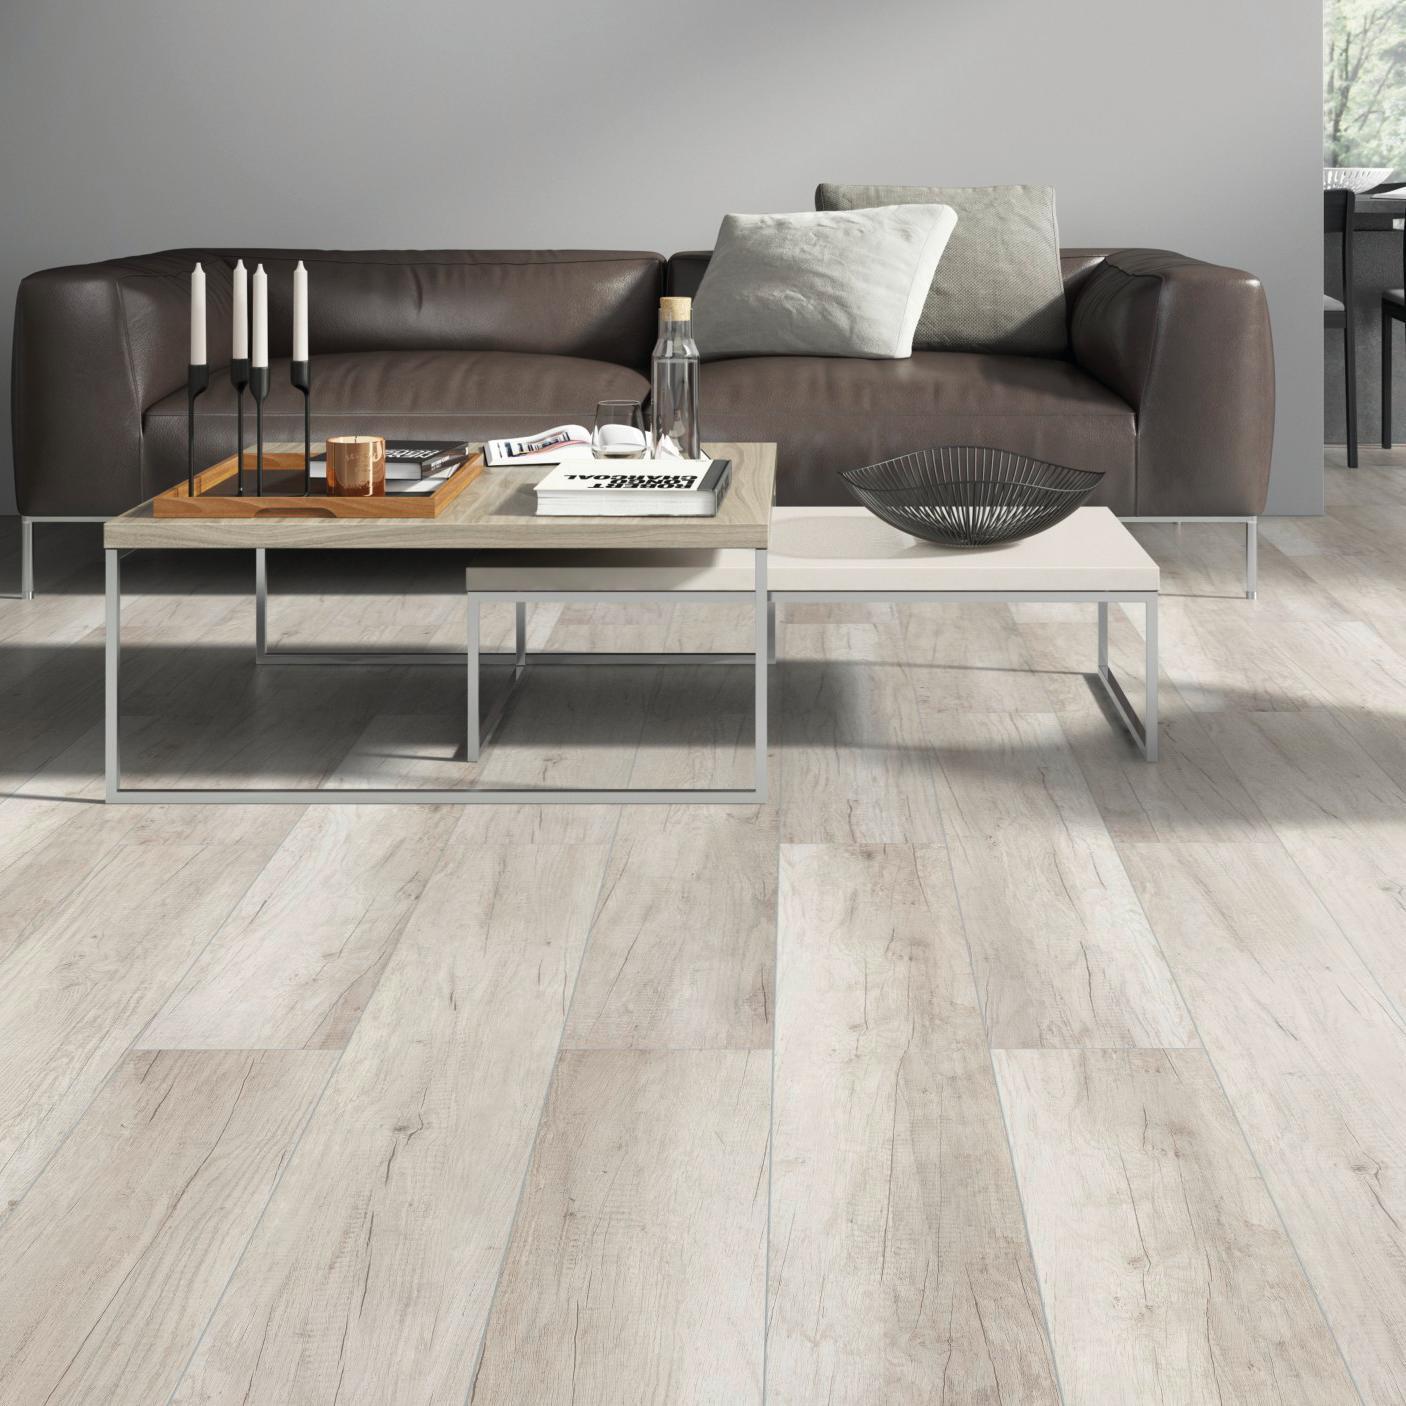 Pavimento laminato H2O Oak Sp 8 mm grigio / argento - 3